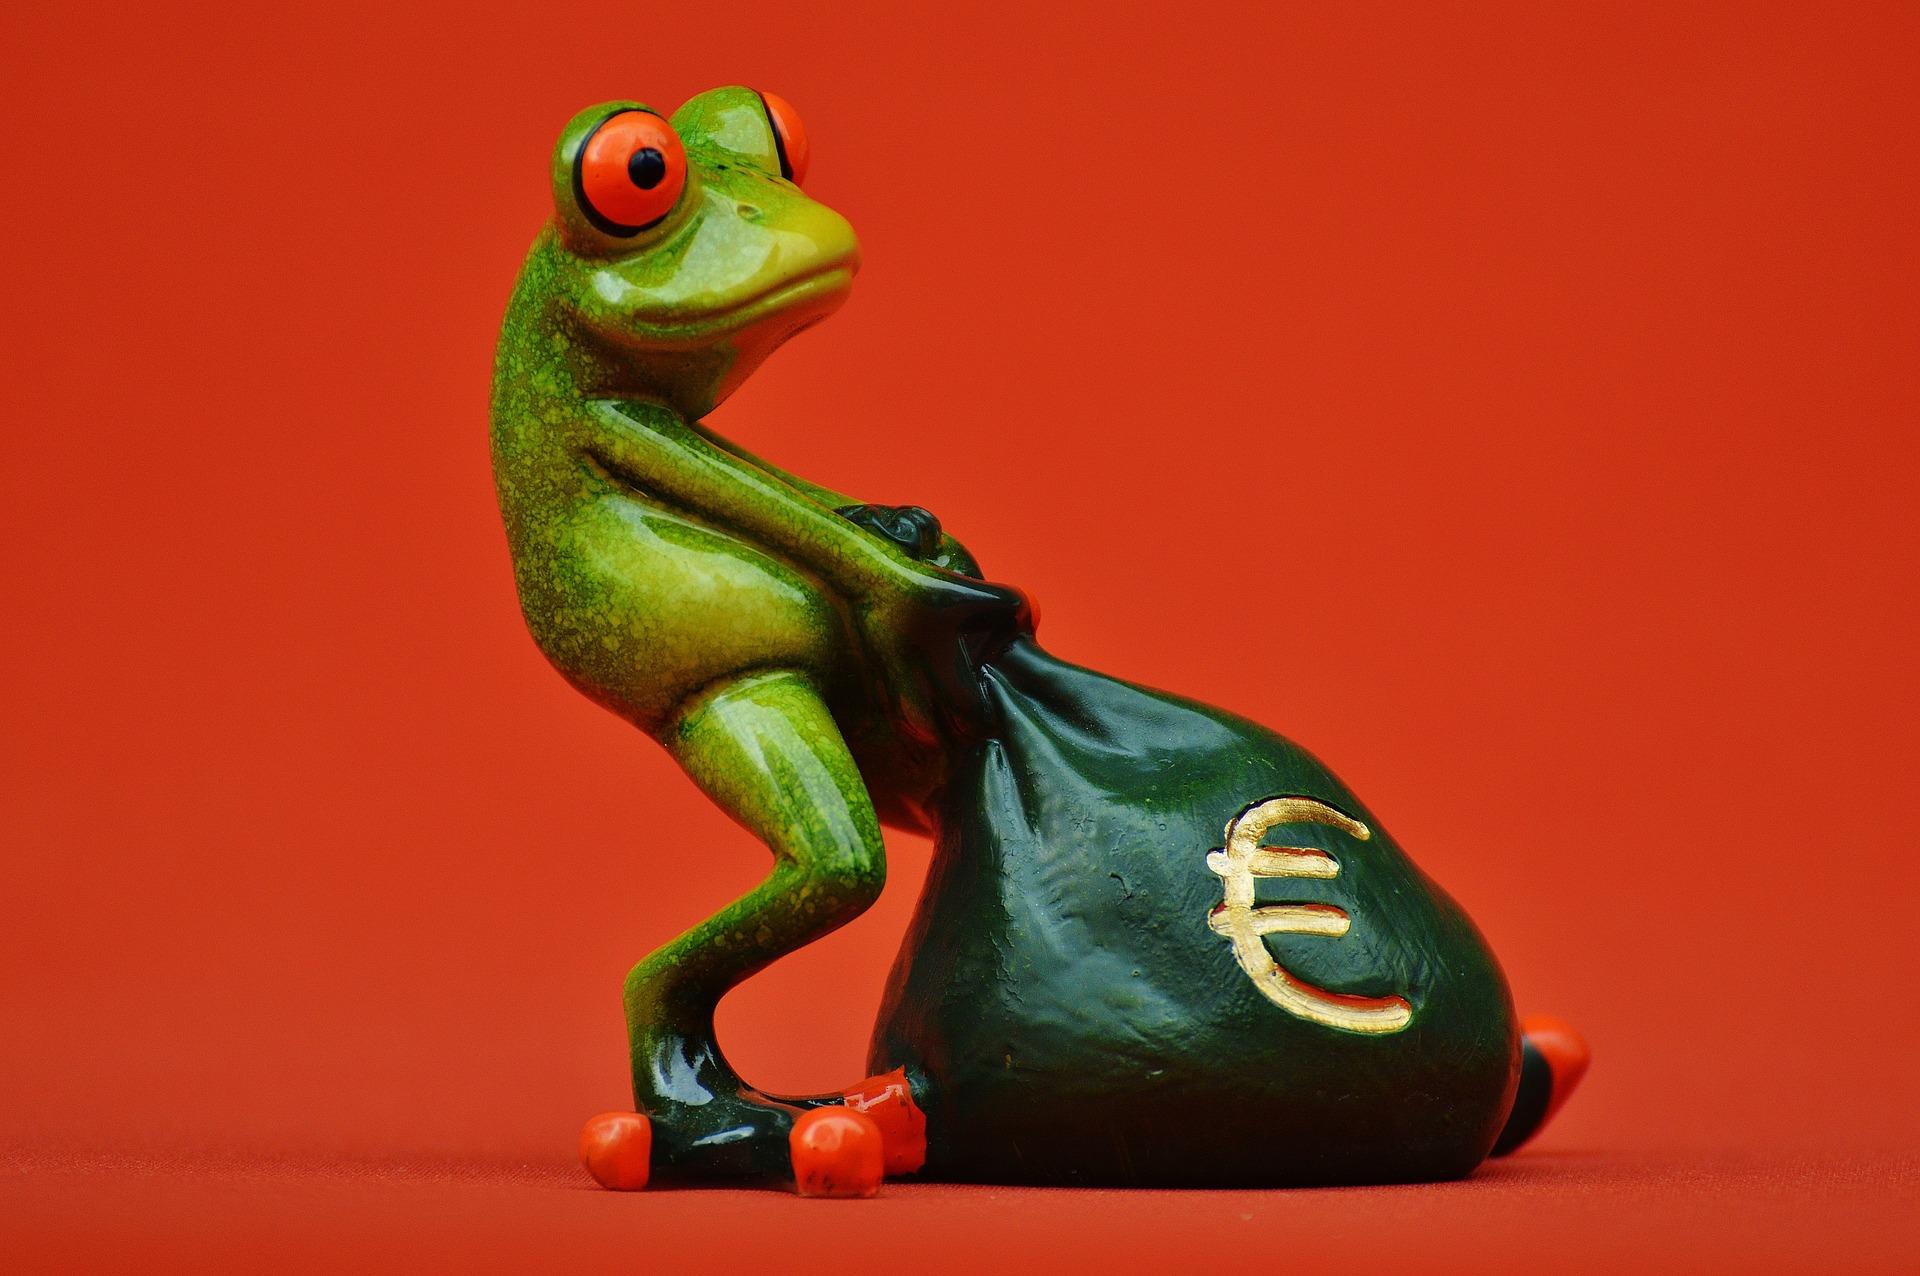 frog-1250491_1920